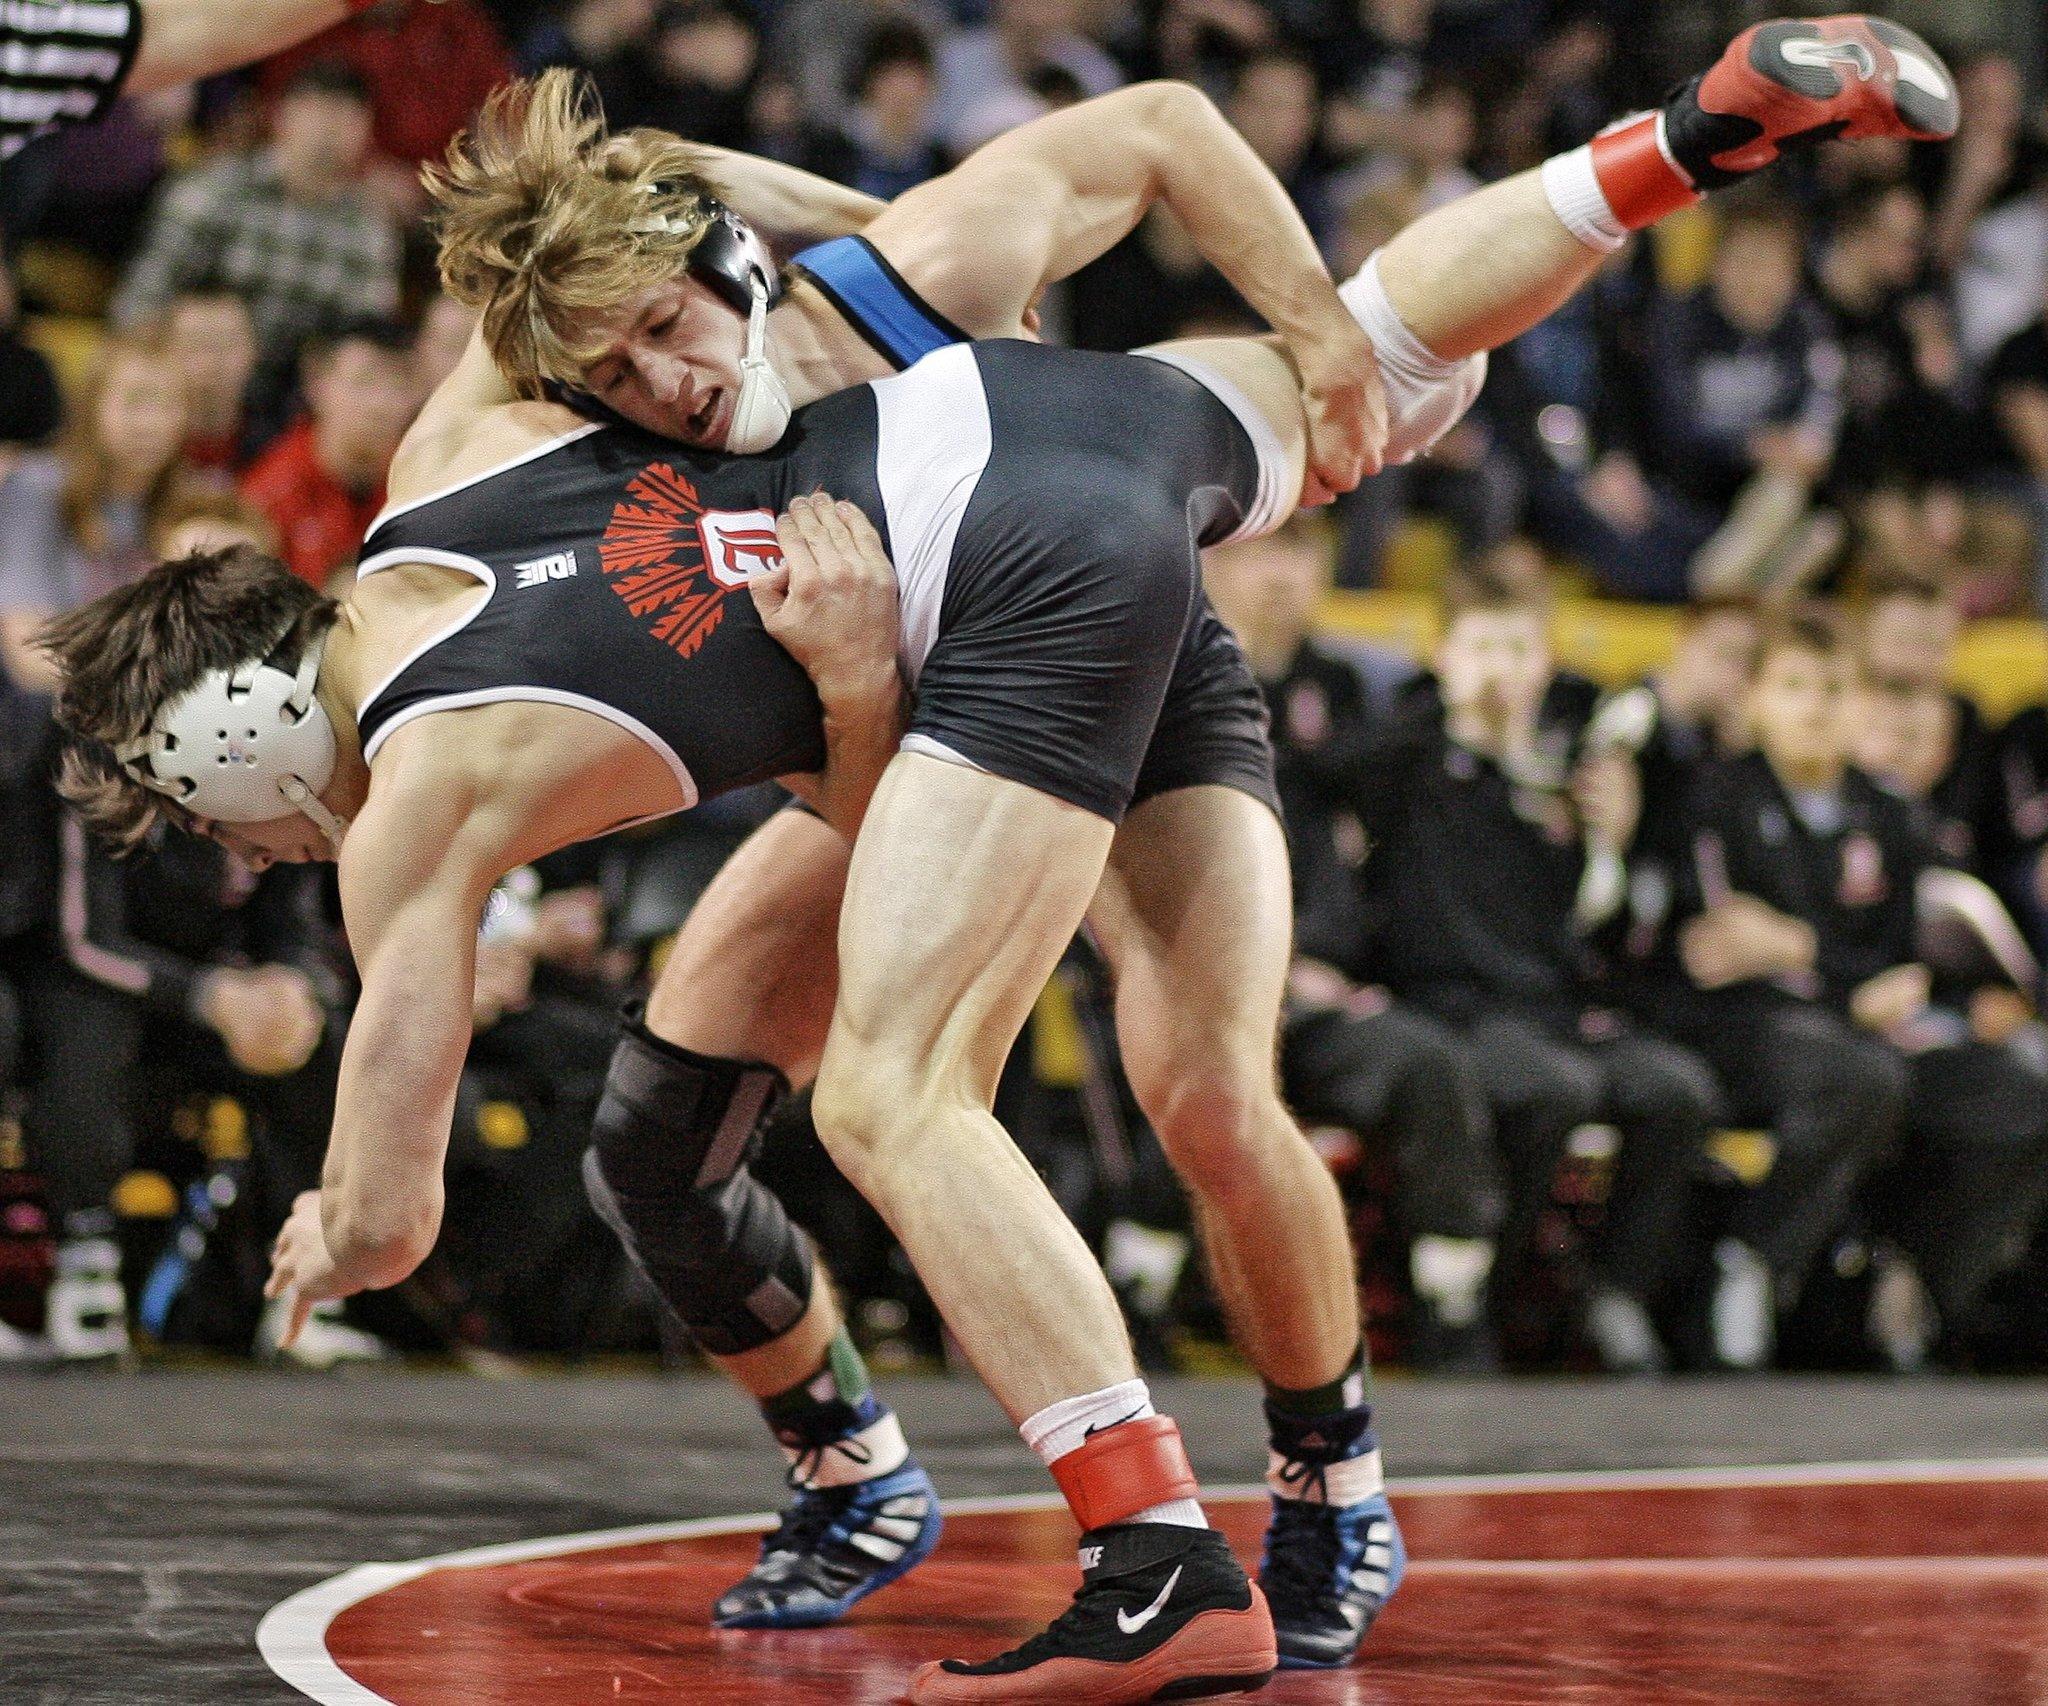 Complete Guide To 2018 High School Team Wrestling State Finals | Mlive.com